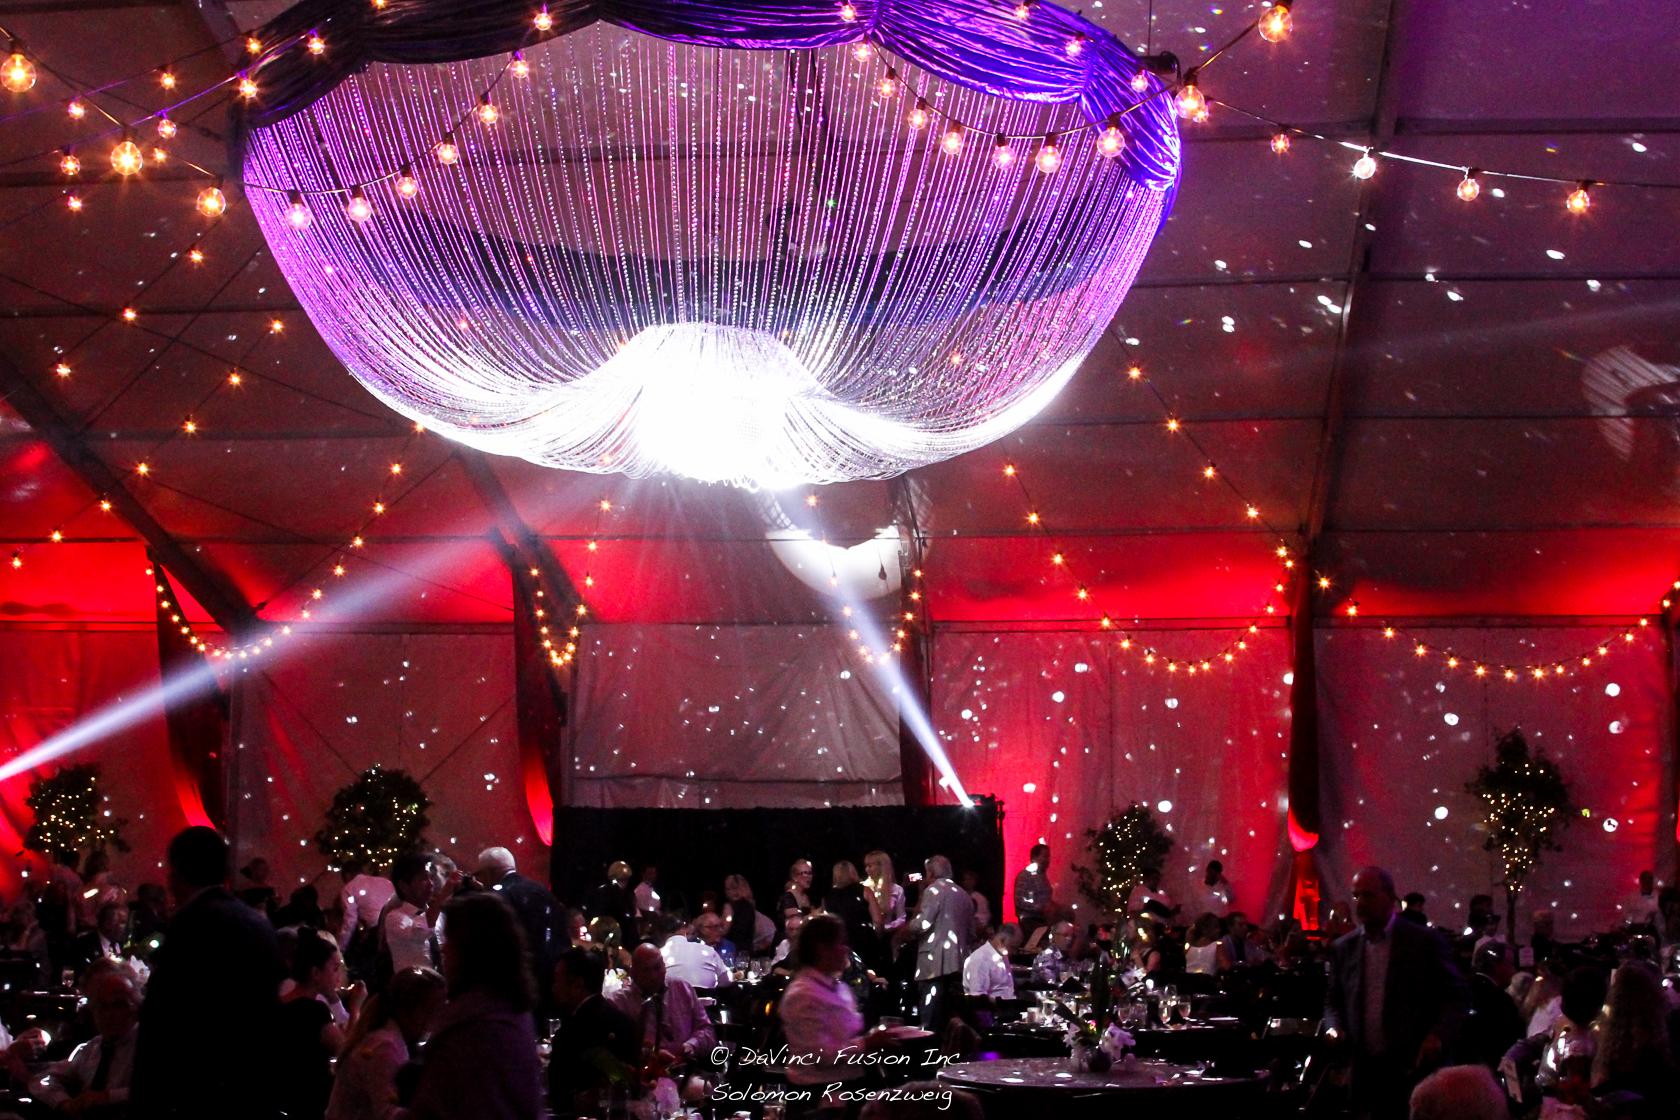 Concours Gala 2015-0602.jpg